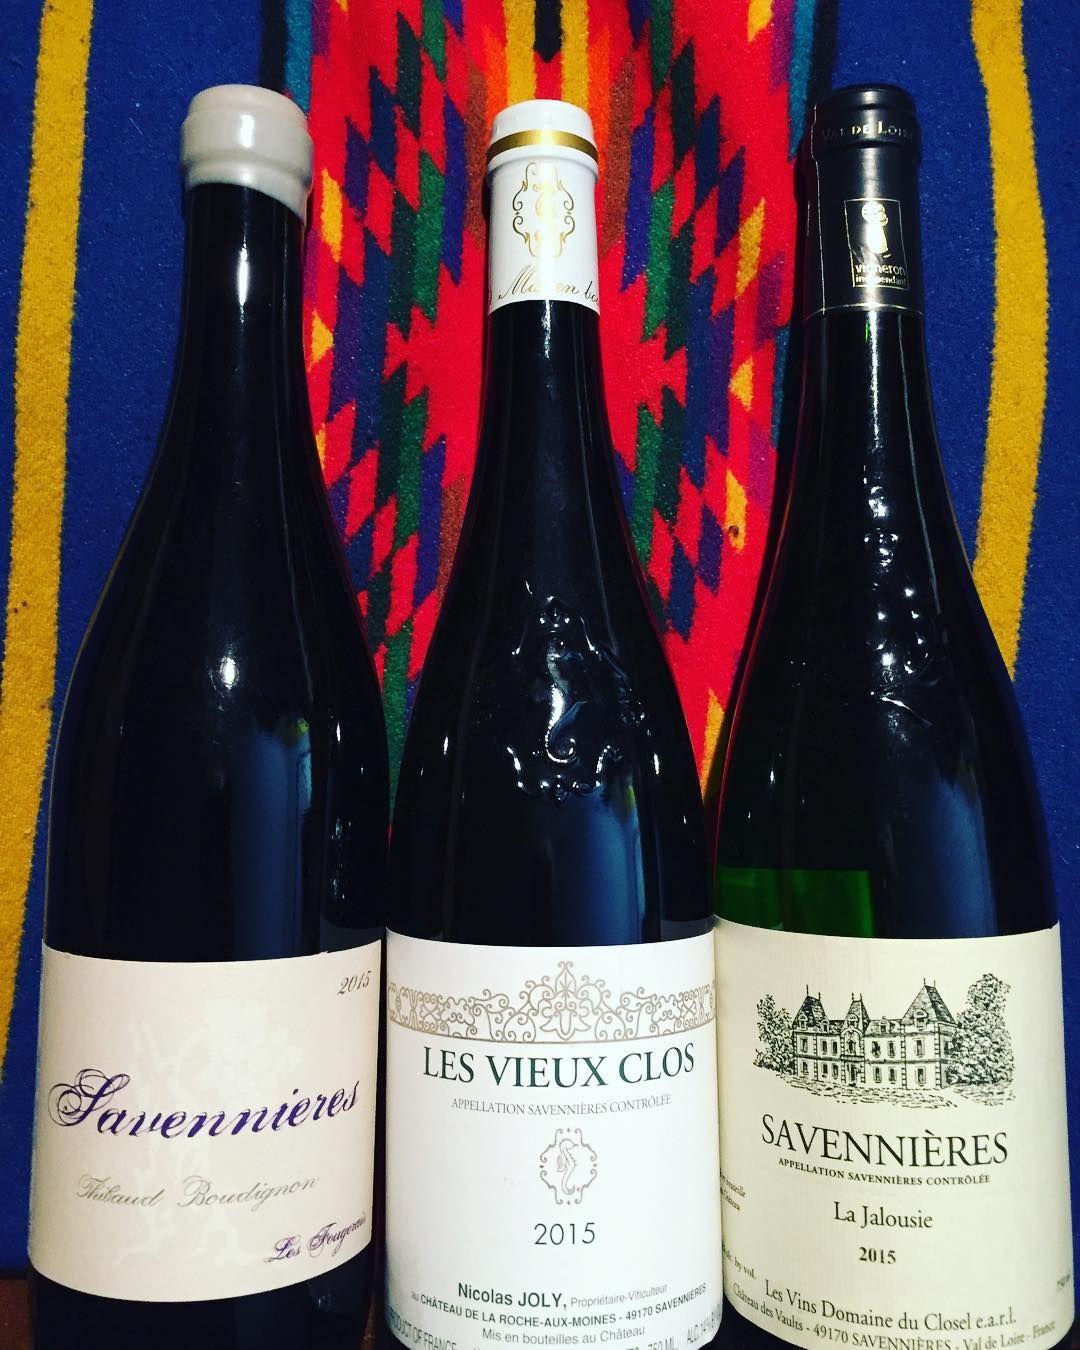 Pin Di Rusli Budirahardjo Su Wine Time Vino Rosso Vino Bevande